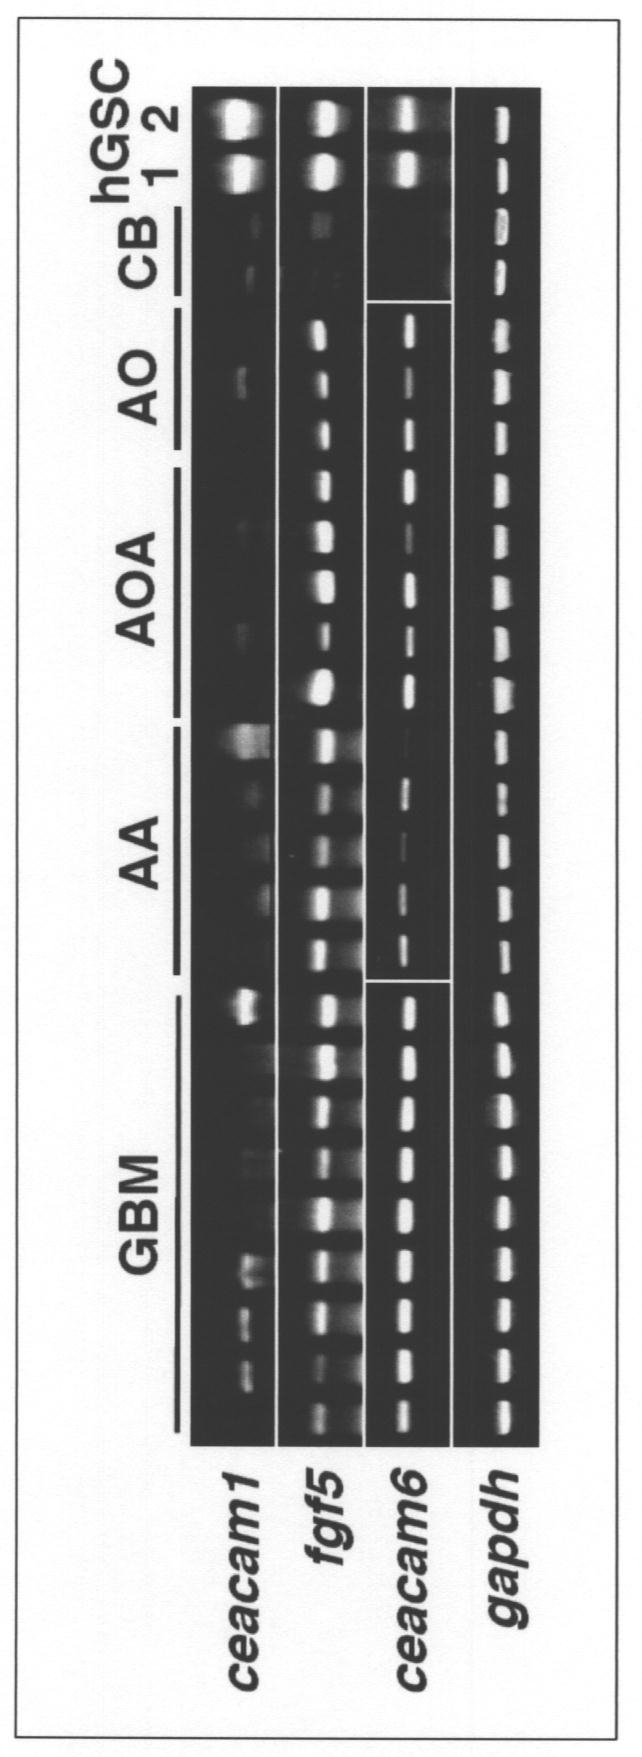 WO2012043747A1 - グリオーマの治療方法、グリオーマの検査方法、所望の物質をグリオーマに送達させる方法、及びそれらの方法に用いられる薬剤         - Google PatentsFamily